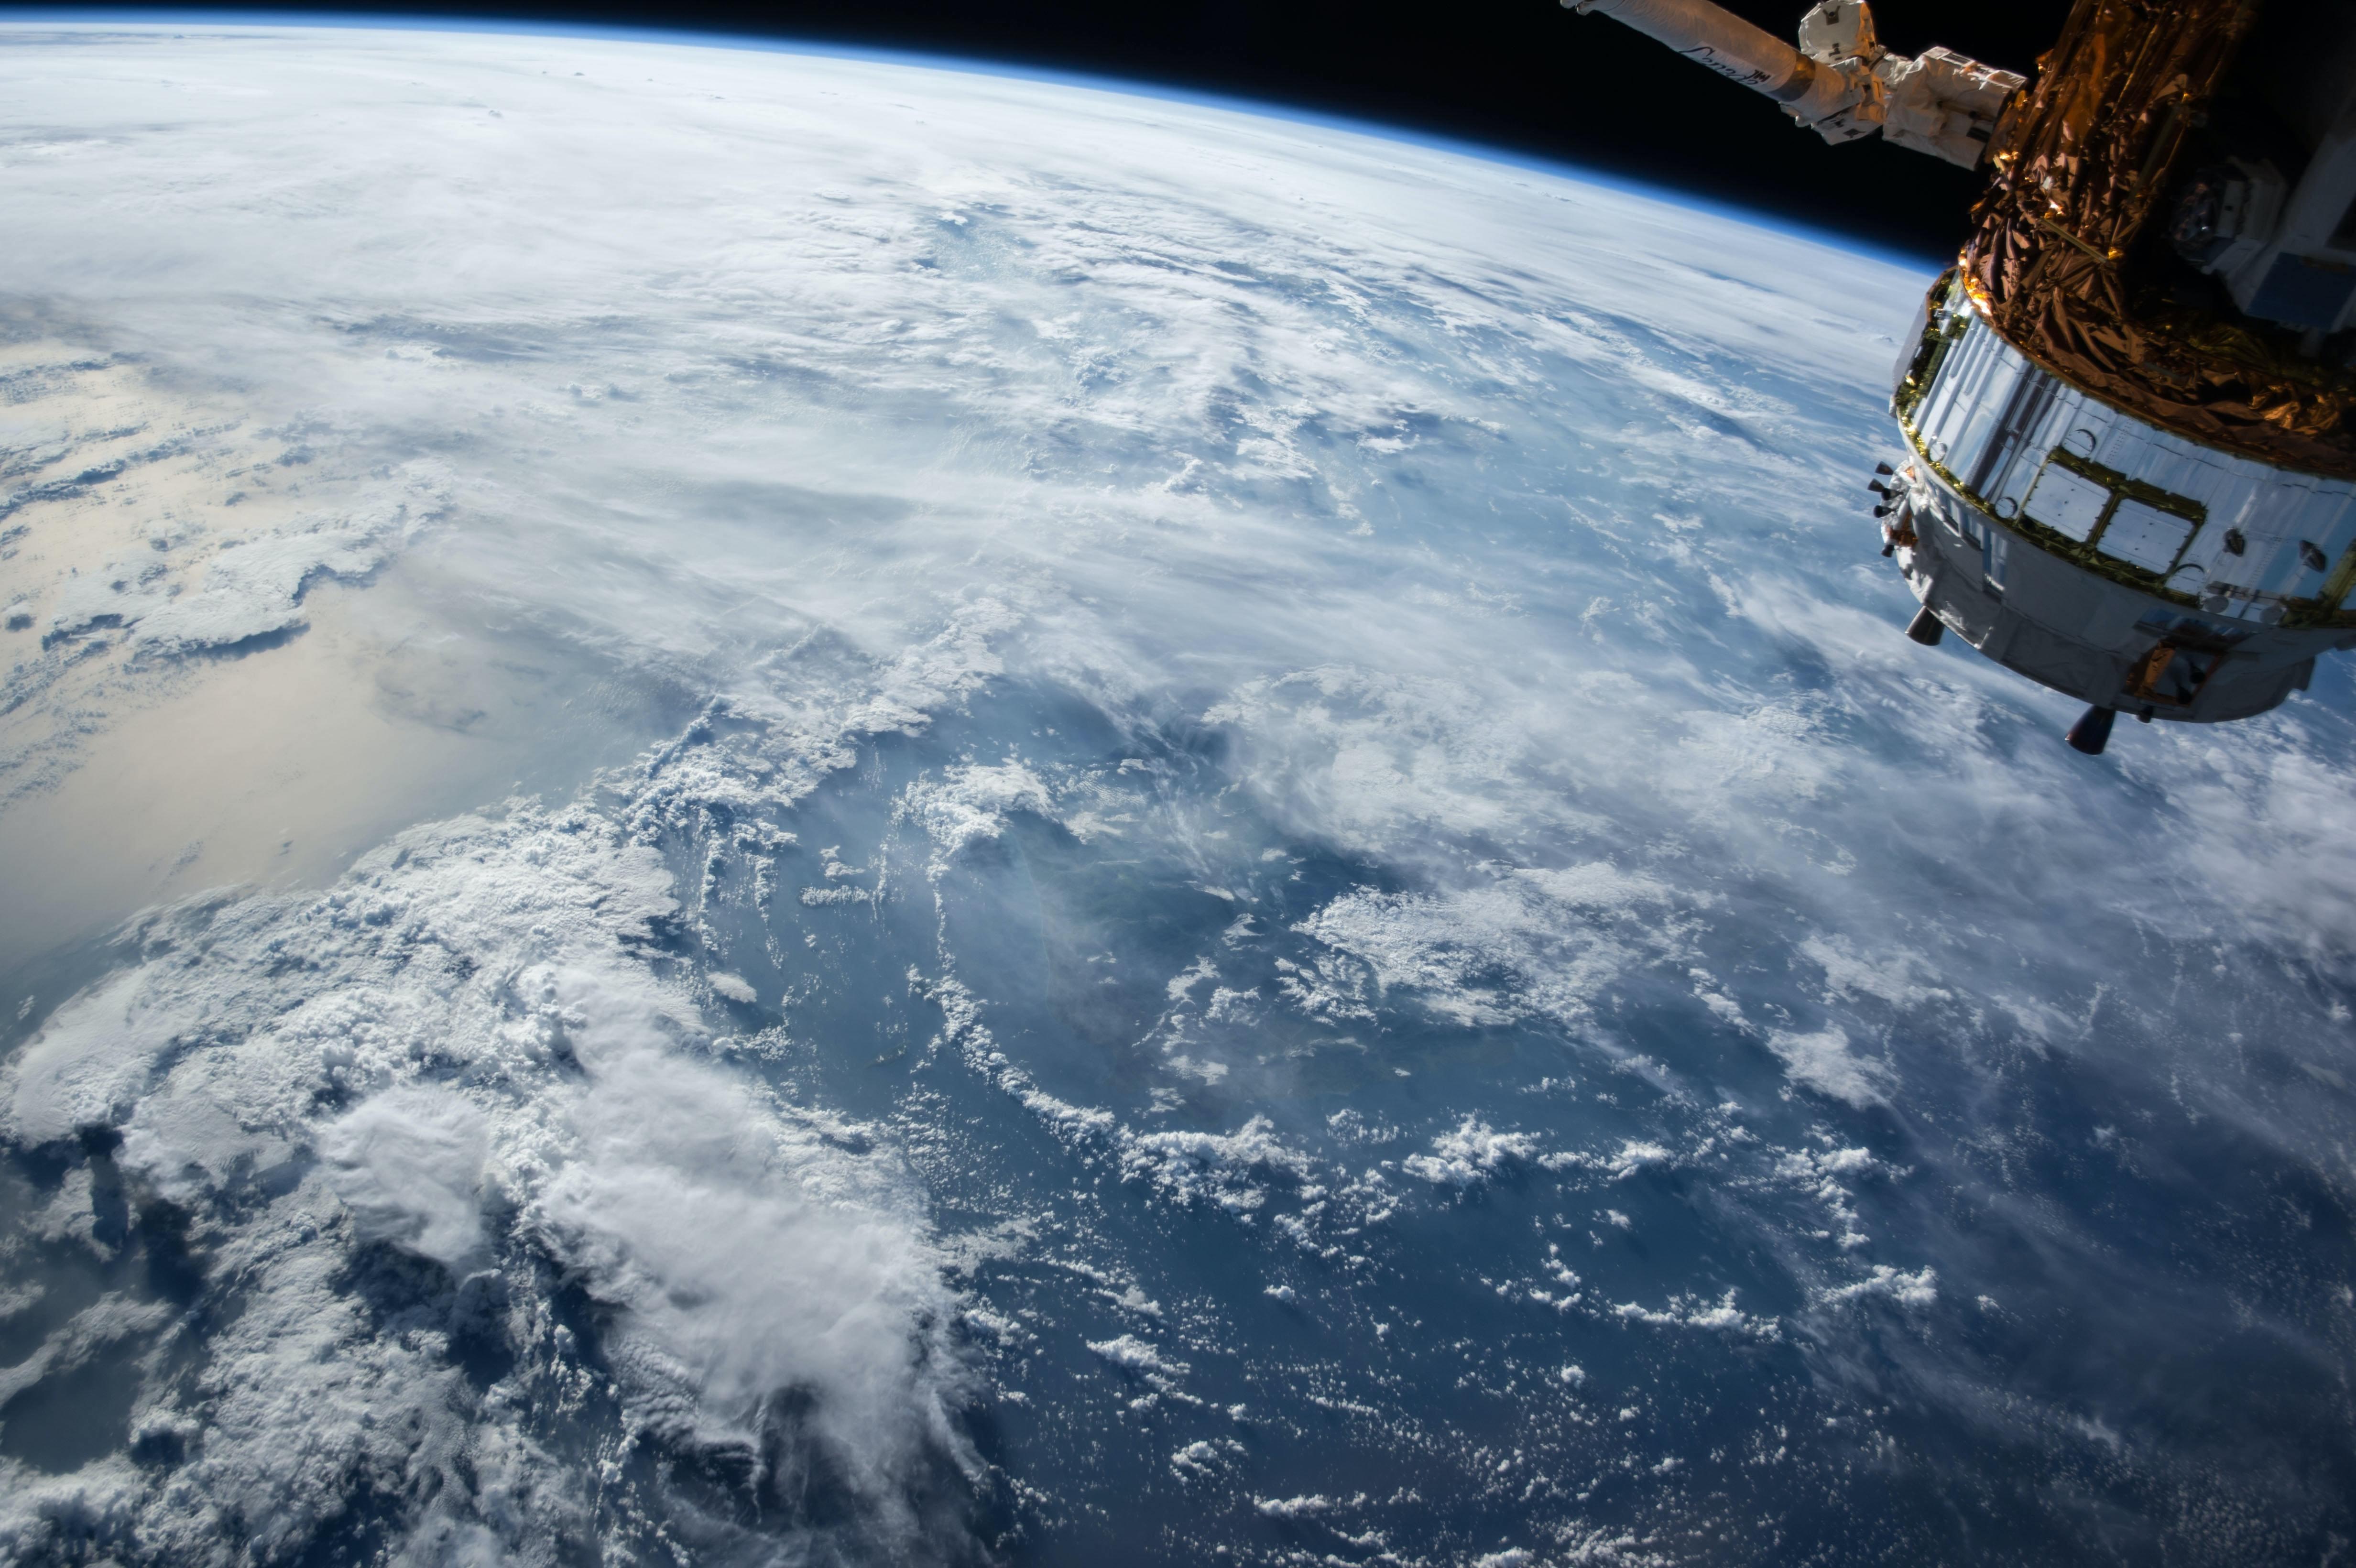 satellite orbit earth space junk climate change nasa pollution humanity orbit rocket launch debris noosphere firefly max polyakov